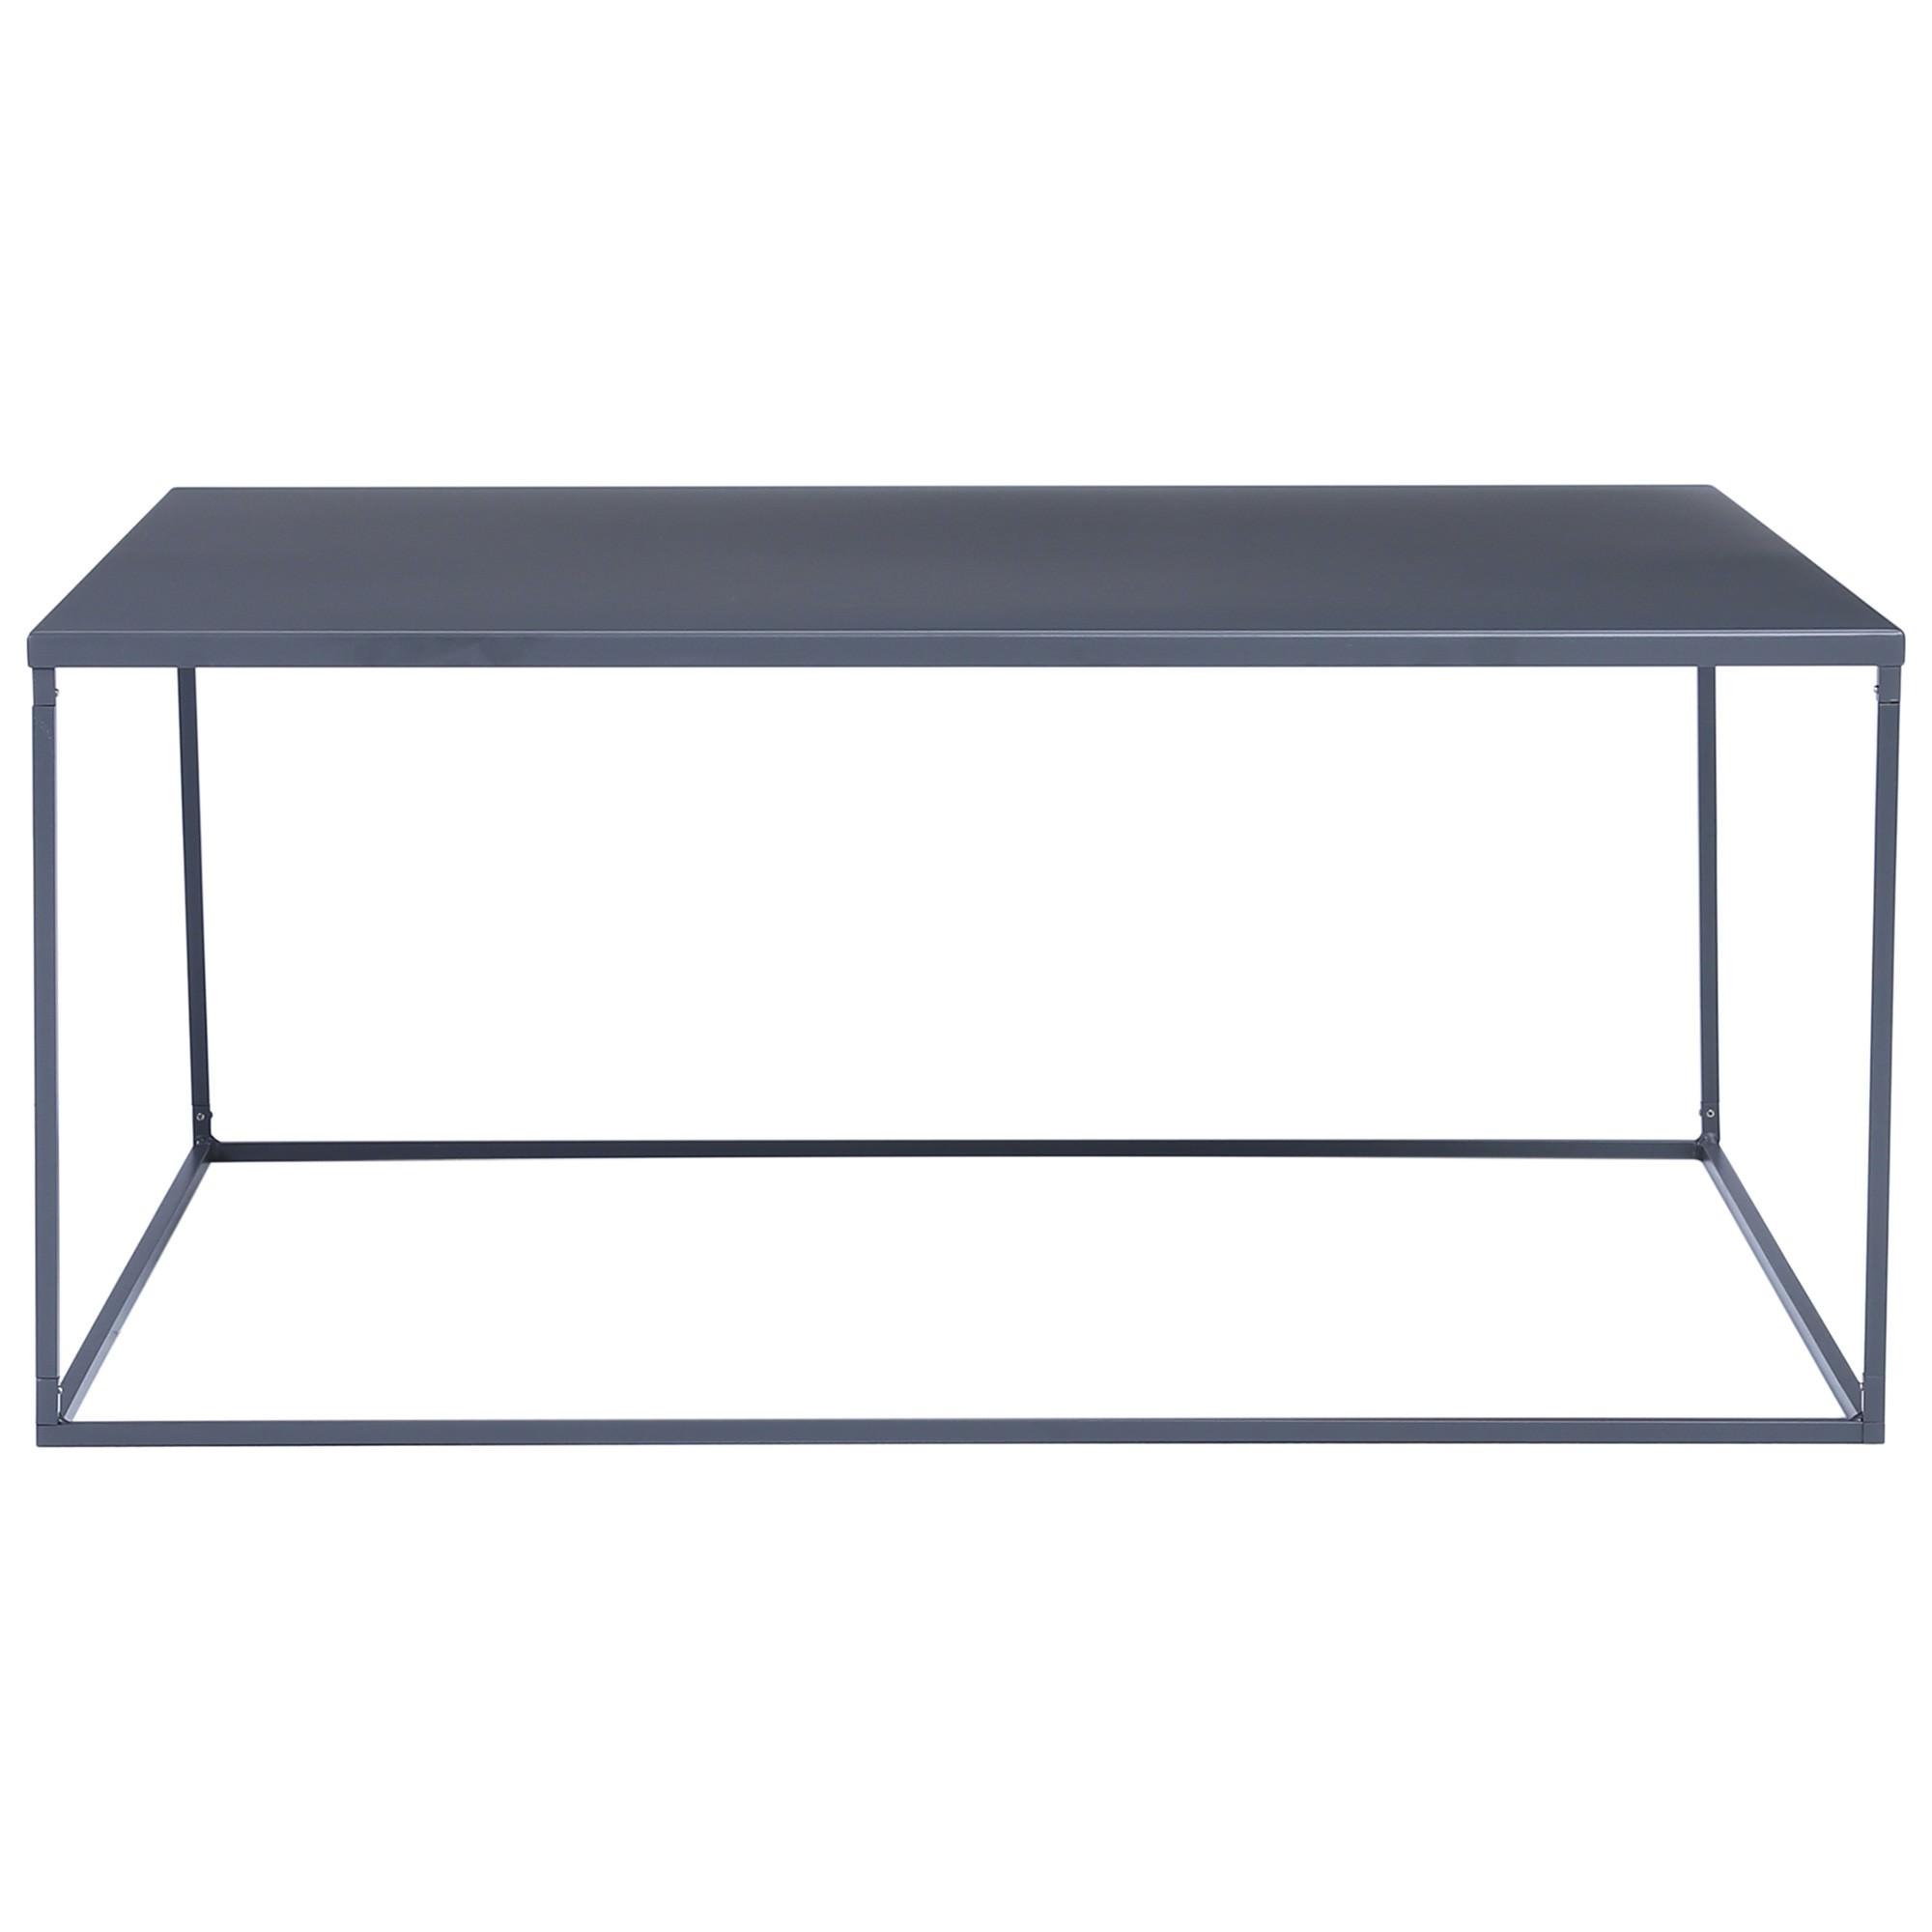 Darnell Metal Square Coffee Table, 80cm, Iridium